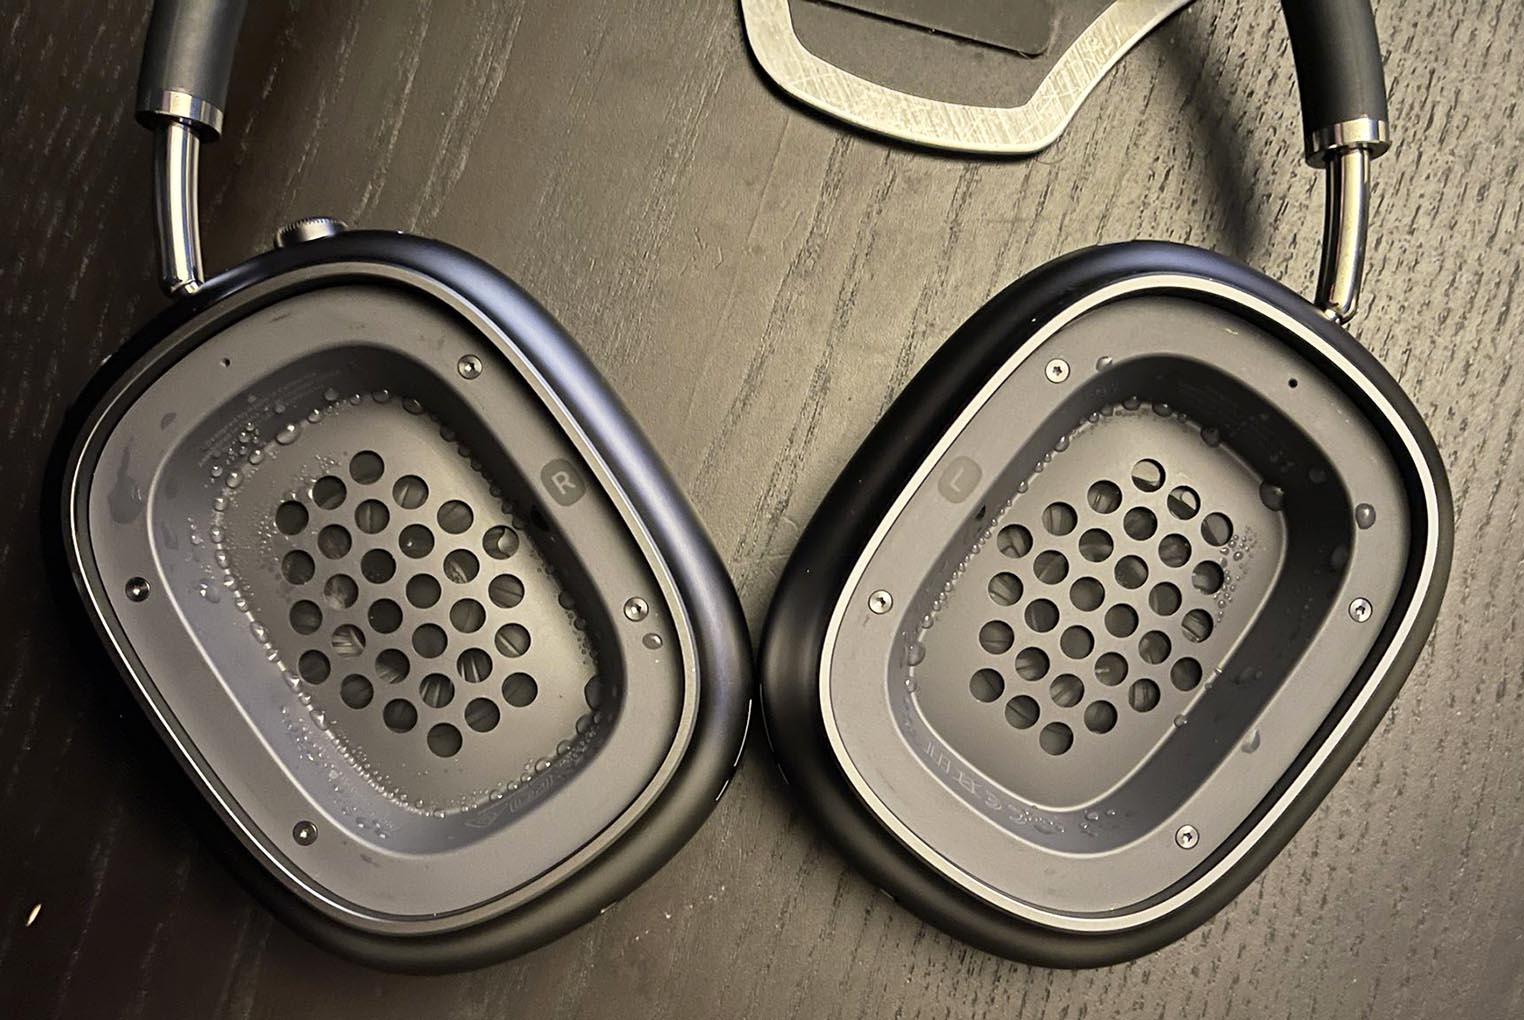 Condensation AirPods Max